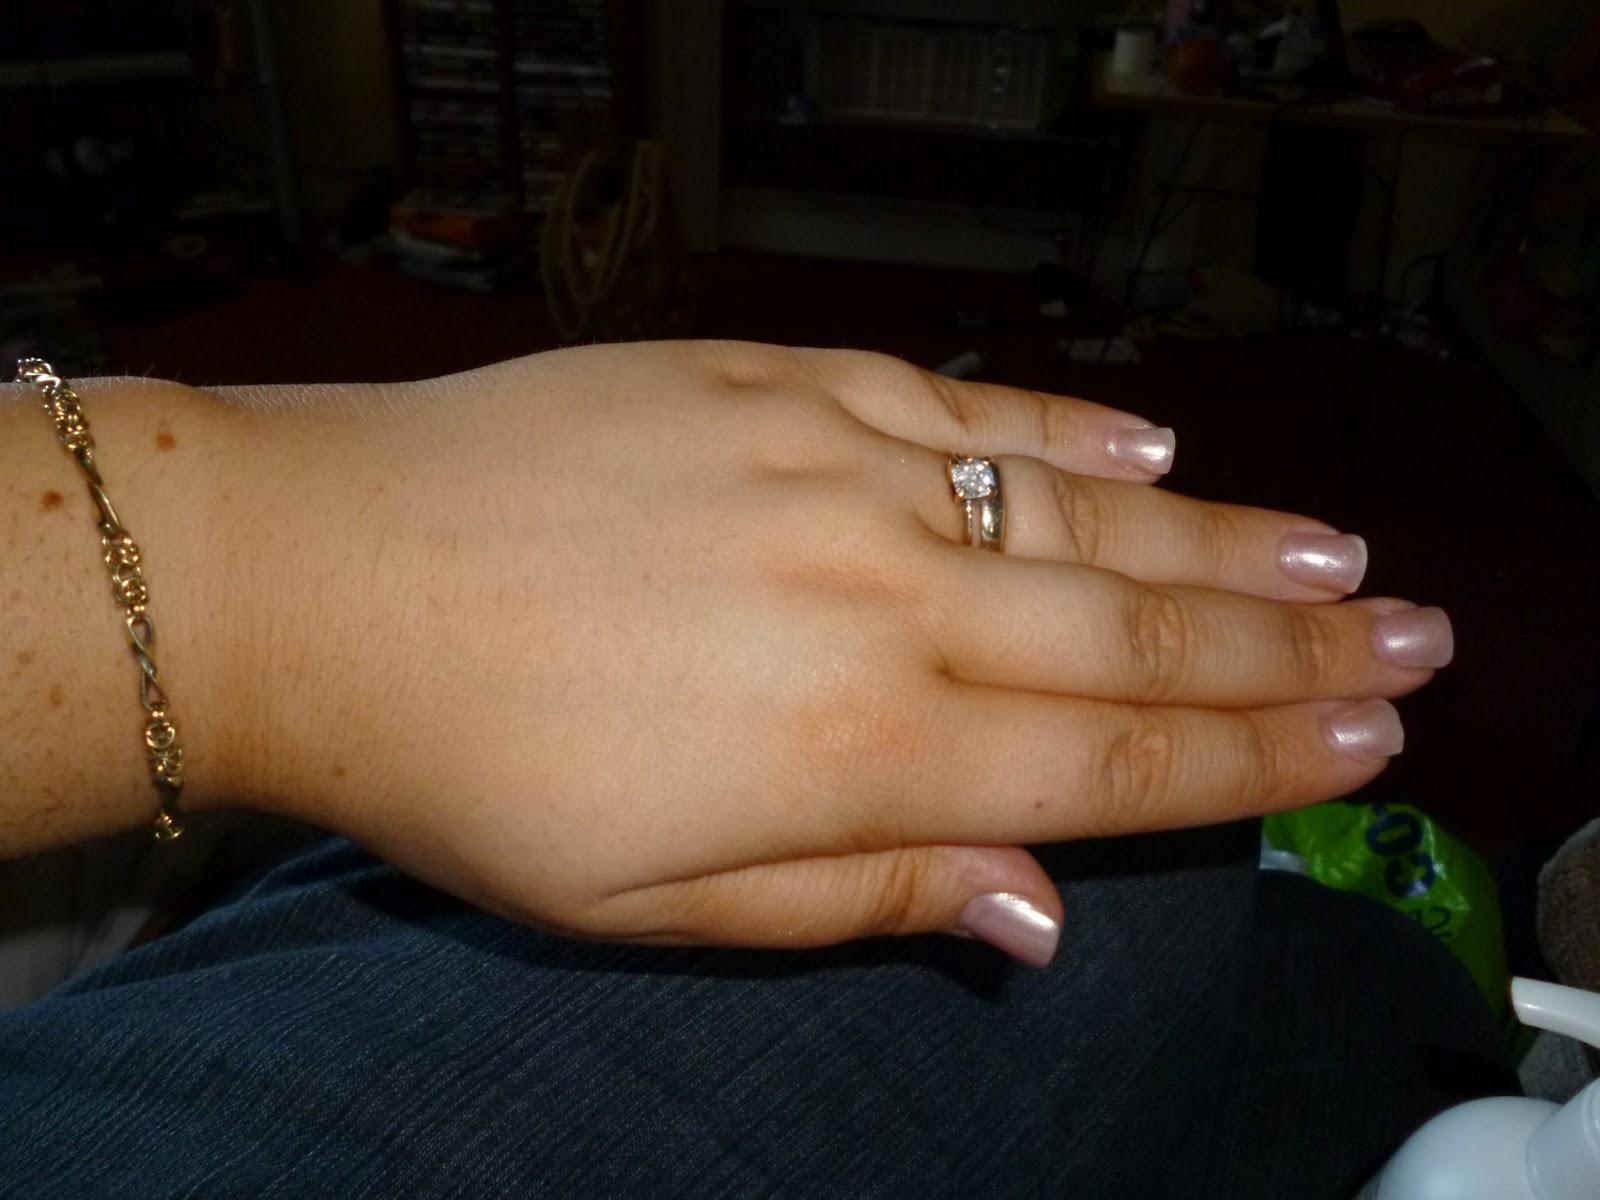 my hands are darker than my skin